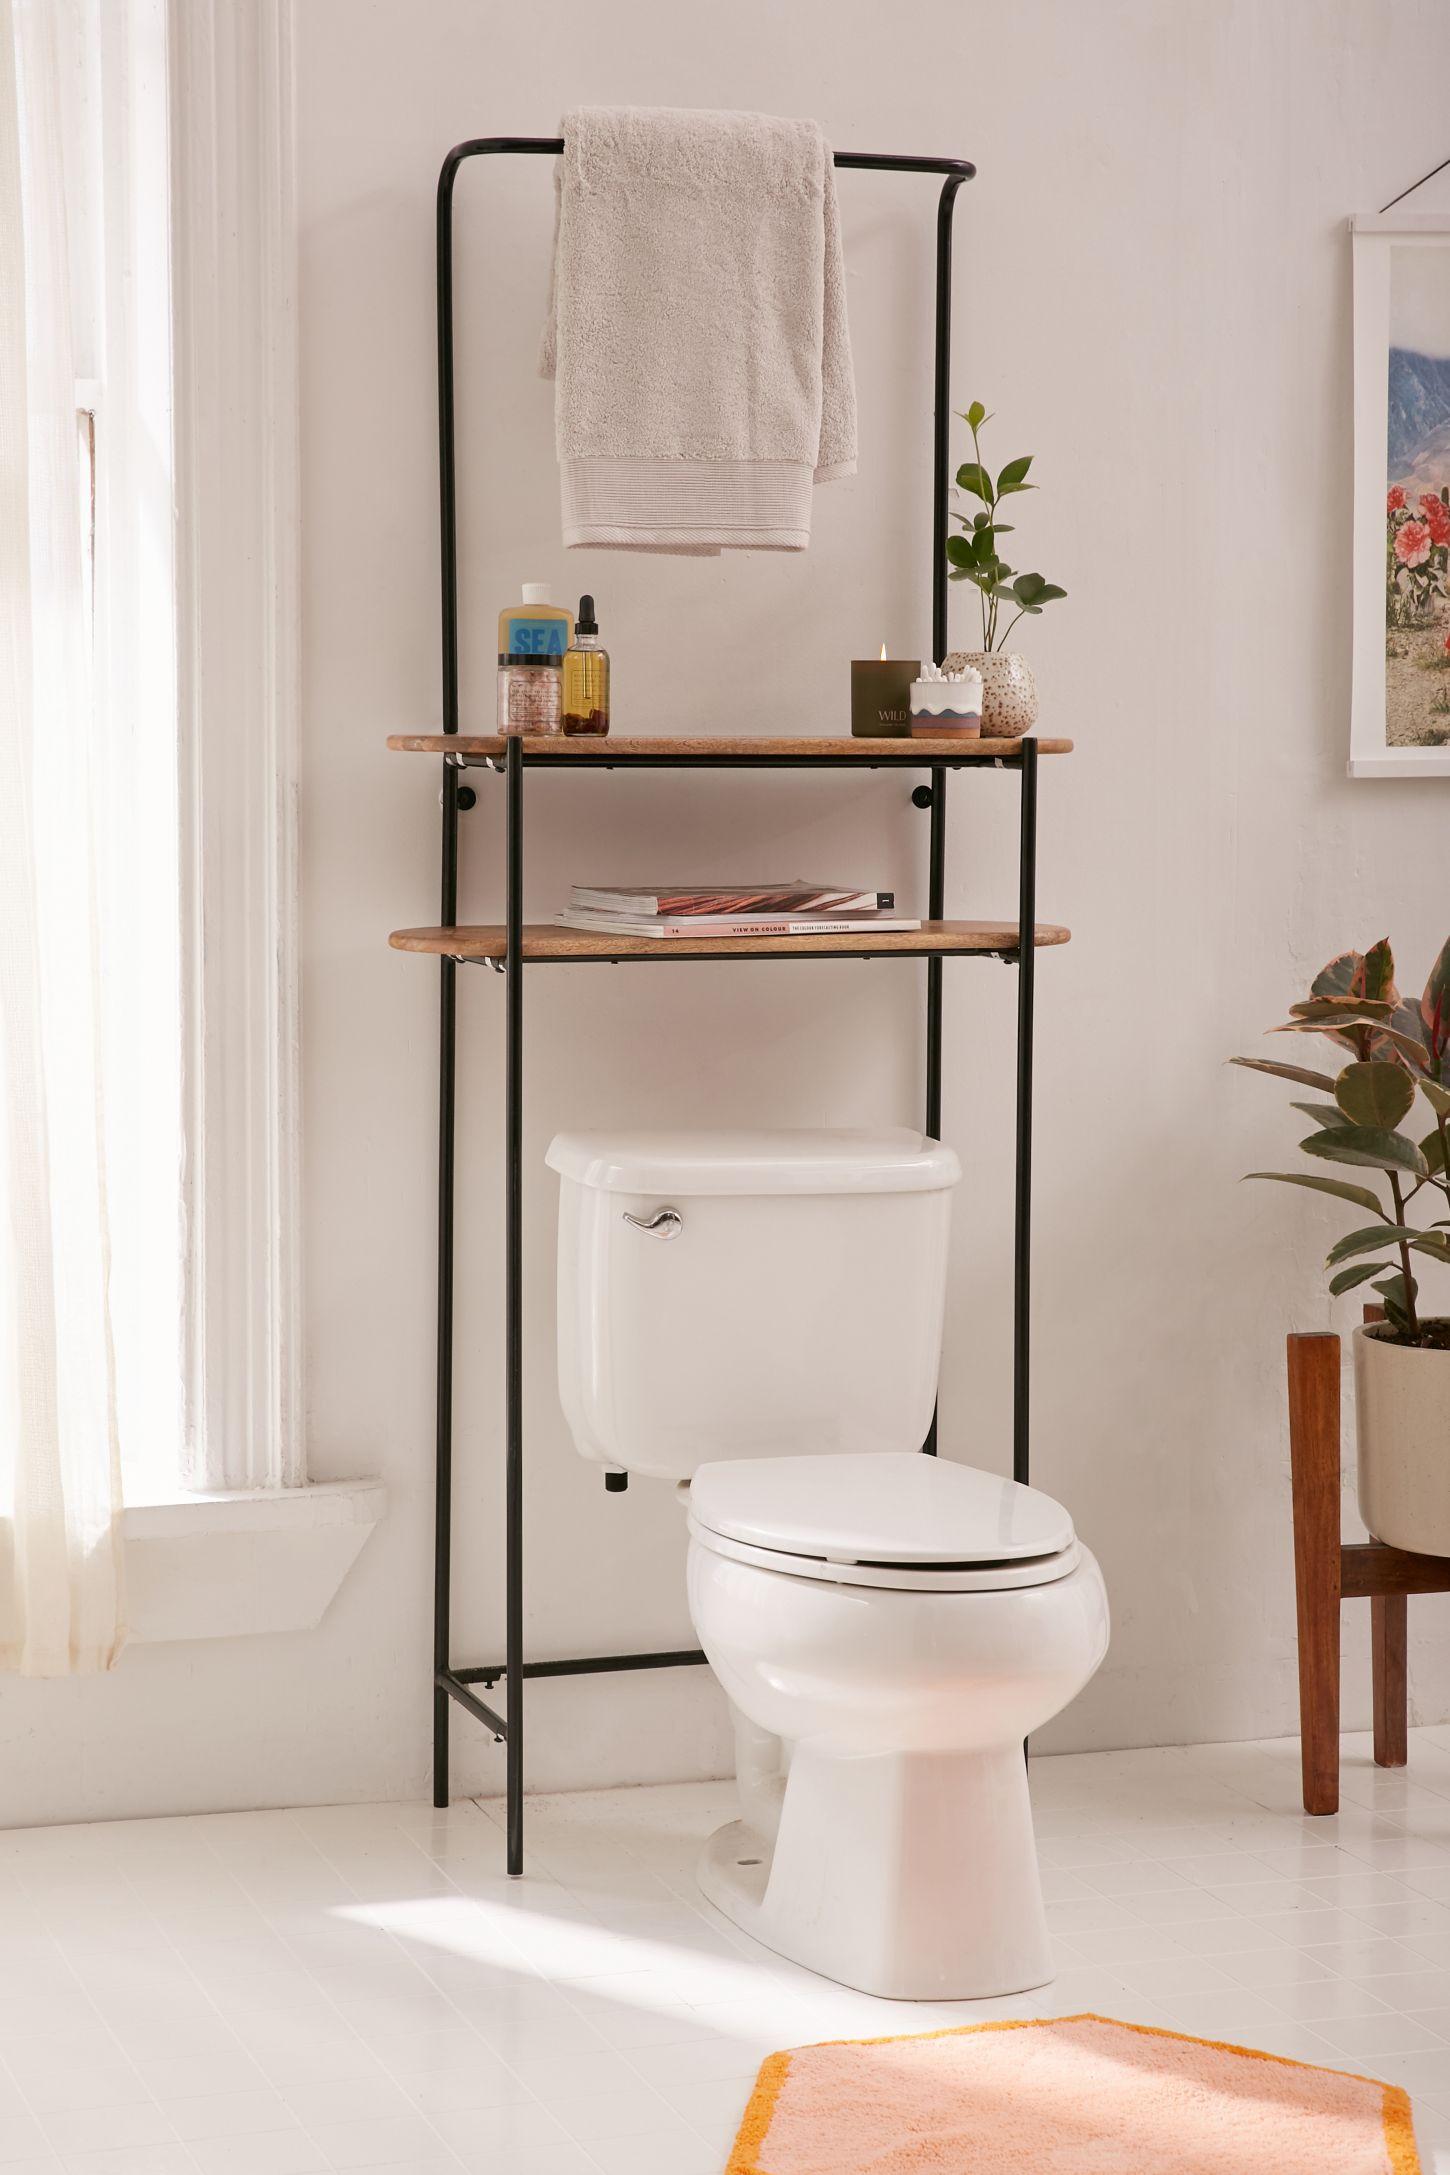 dorset bathroom storage shelf | urban outfitters